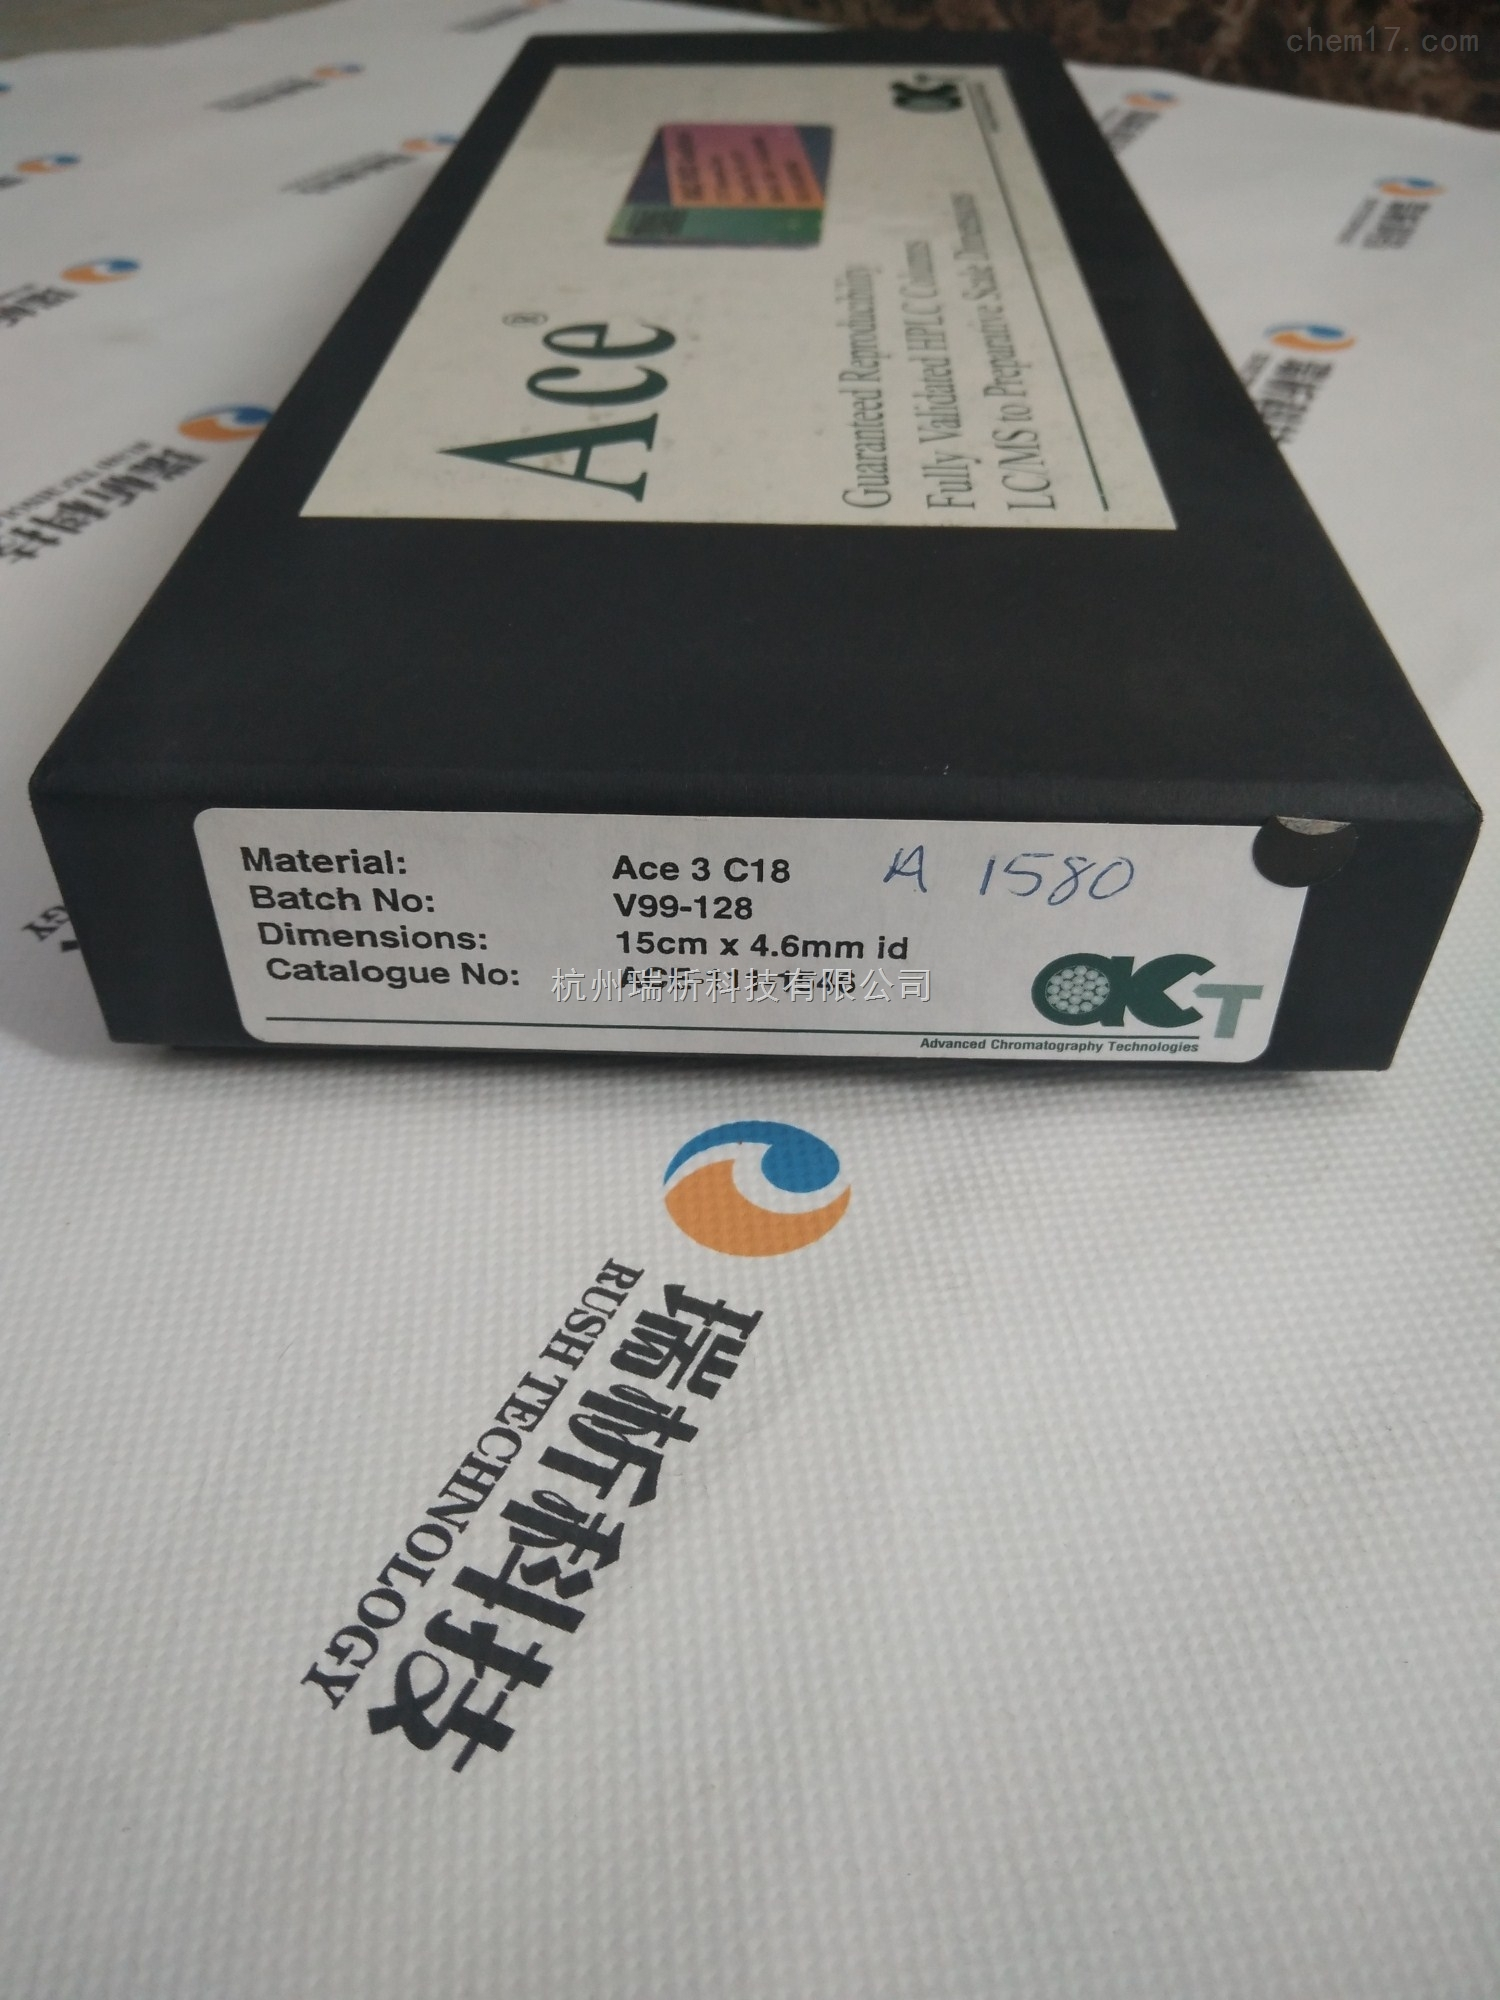 ace-111-1546色谱柱液相色谱柱dimensions   15cm   4.6mmid   catalogue